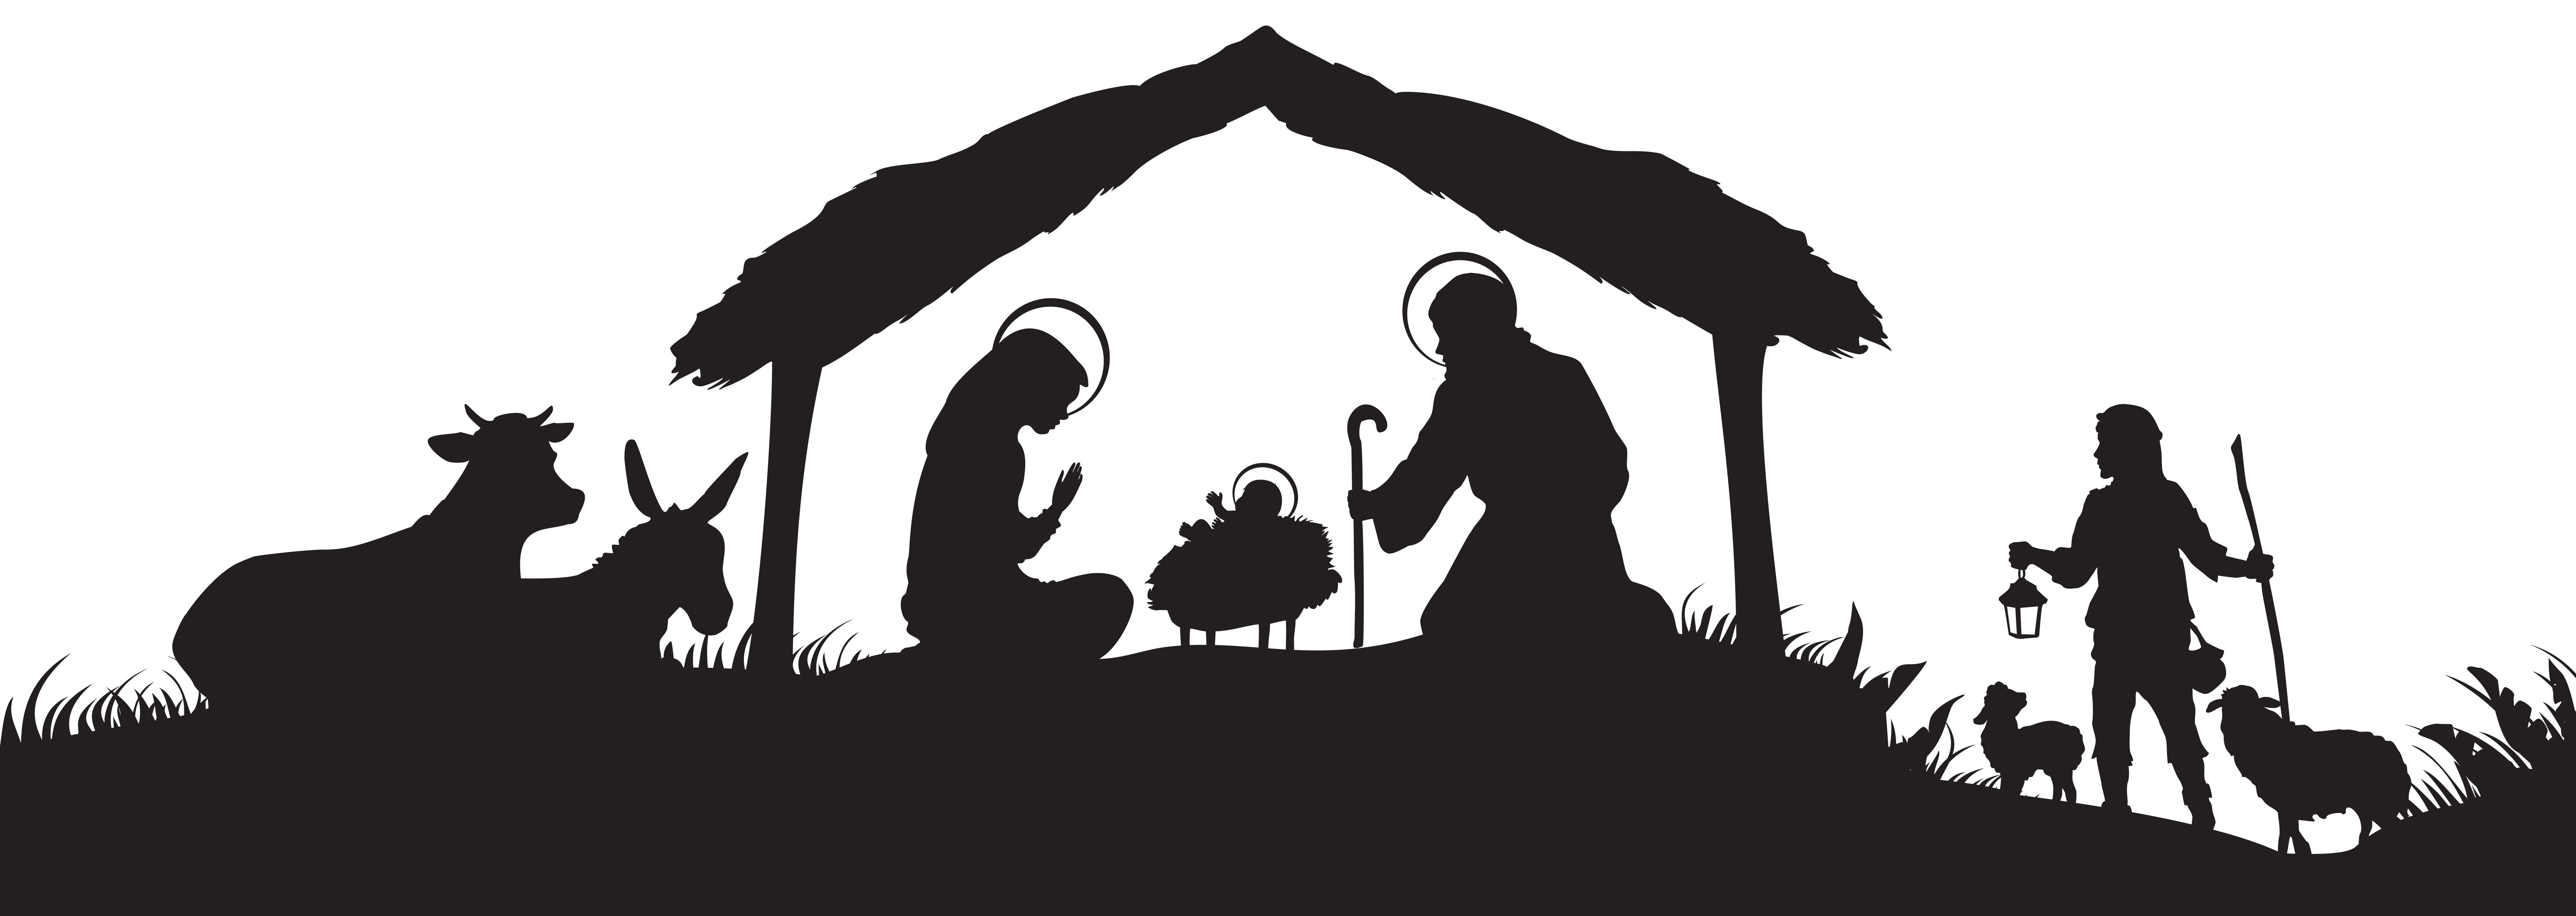 free christmas nativity clipart 18 [ 8000 x 2846 Pixel ]